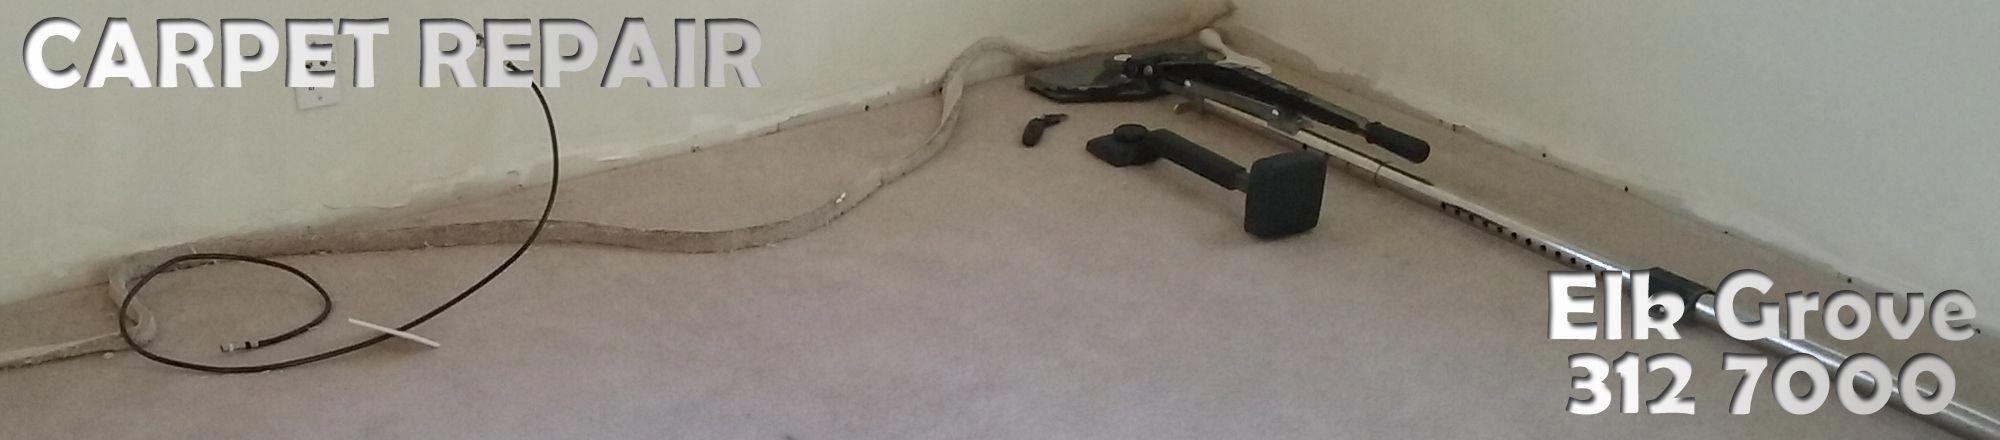 Best Carpet Repair Services in the city of Elk Grove CA